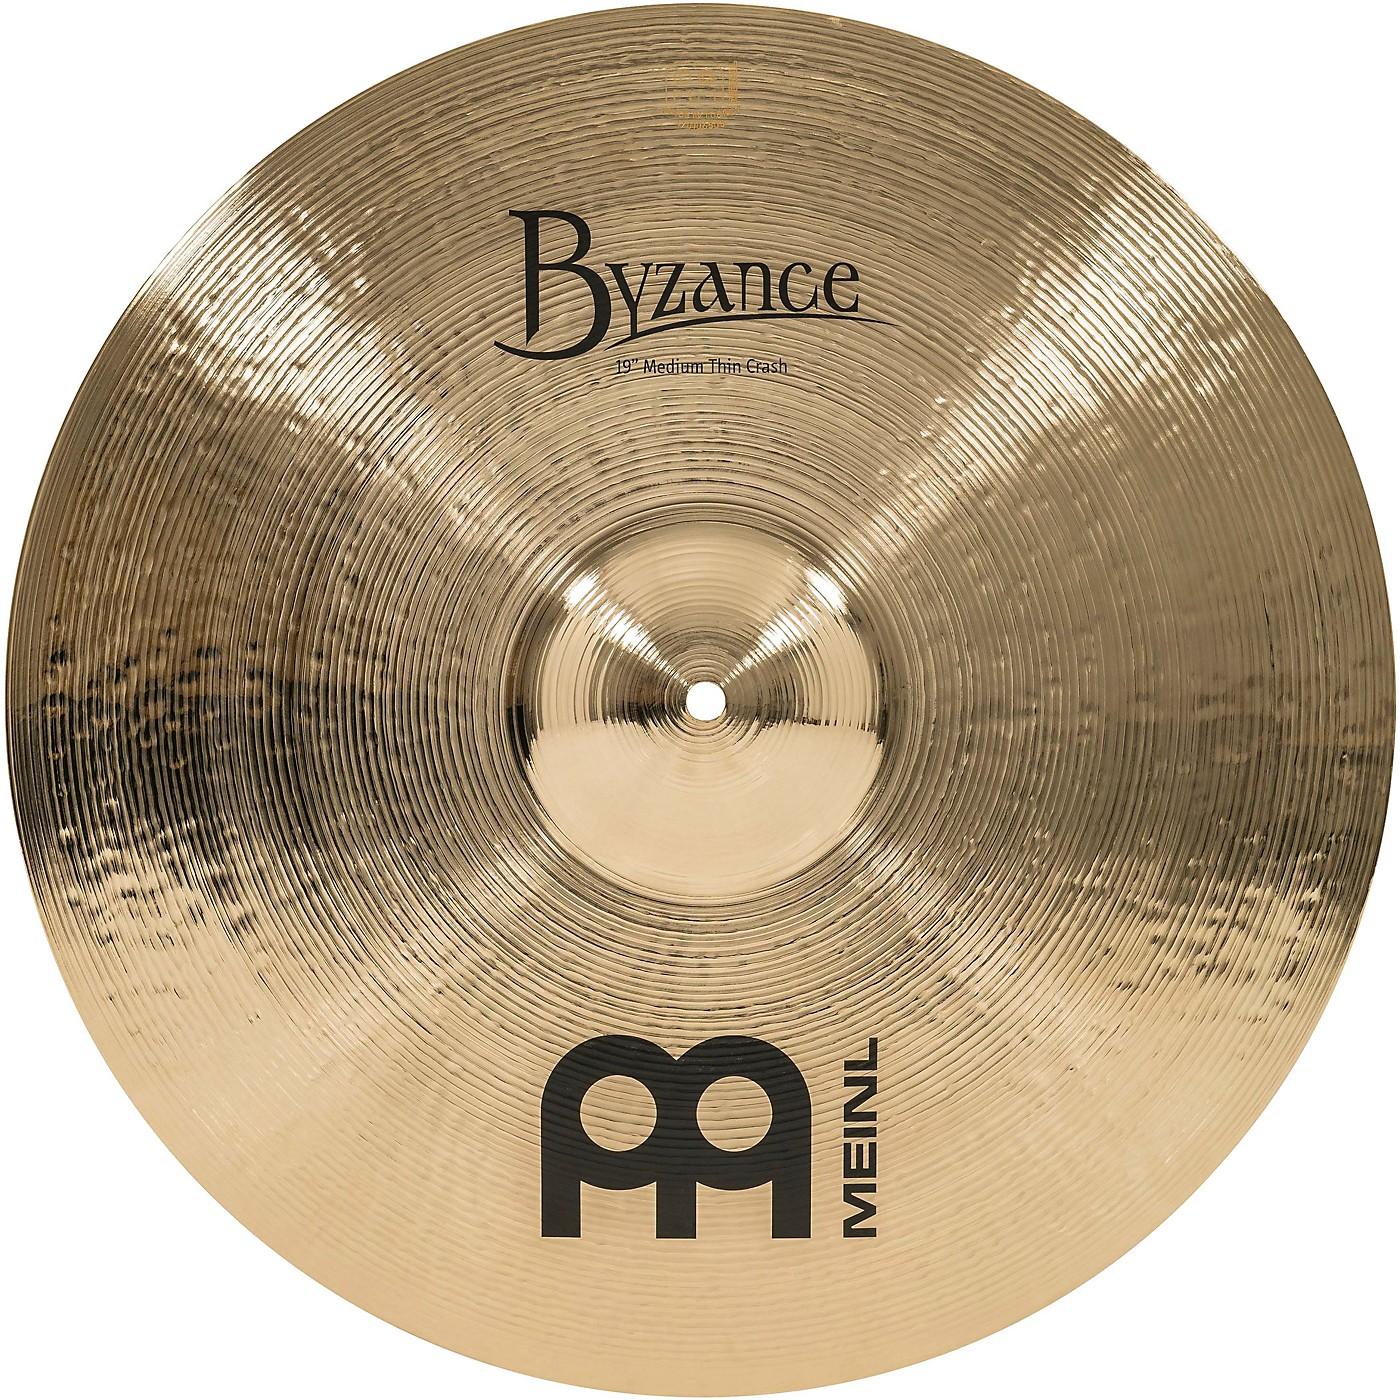 Meinl Byzance Medium Thin Crash Brilliant Cymbal thumbnail